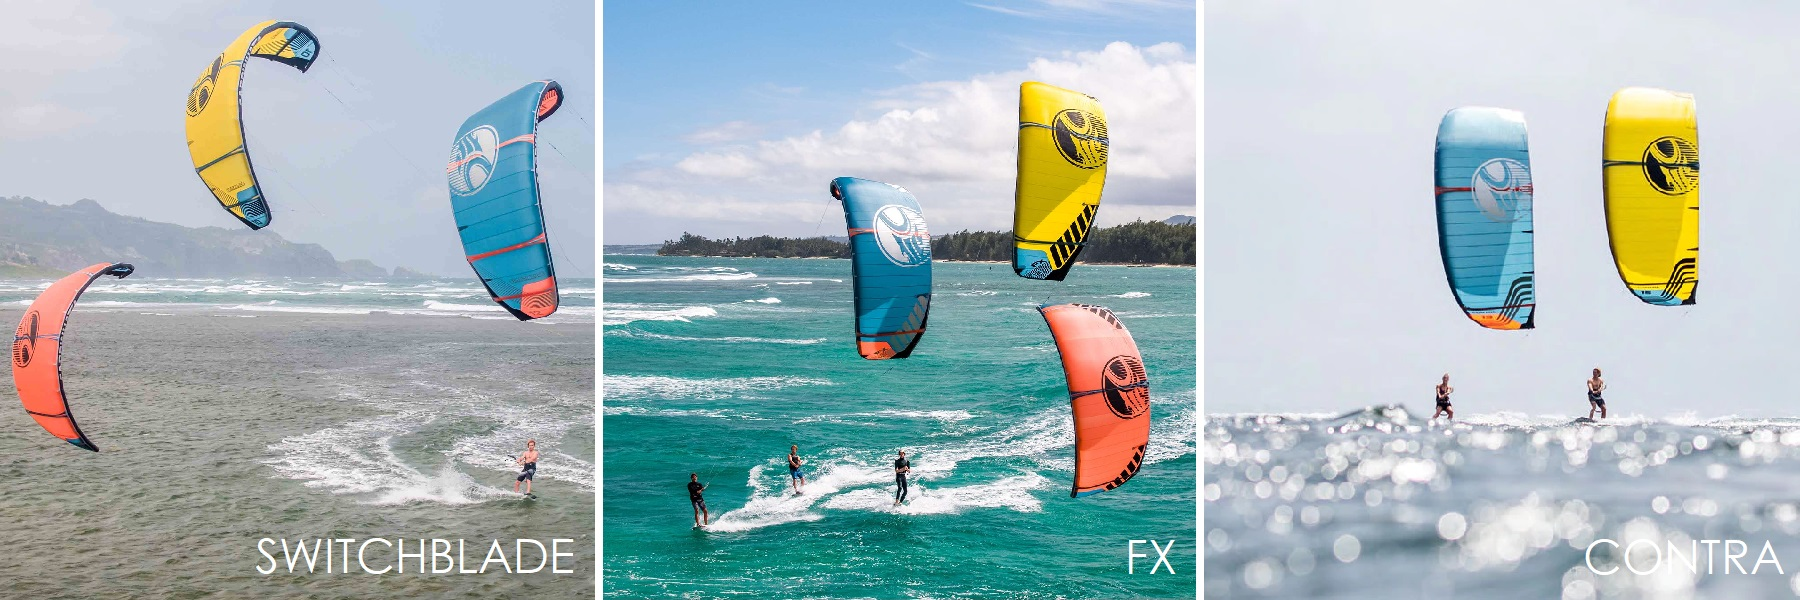 location kite sicile; cabrinha kite sicile; louer materiel kitesurf lo stagnone; location kitesurf lo stagnone sicile; duotone kite sicile; duotone evo italy; duotone location